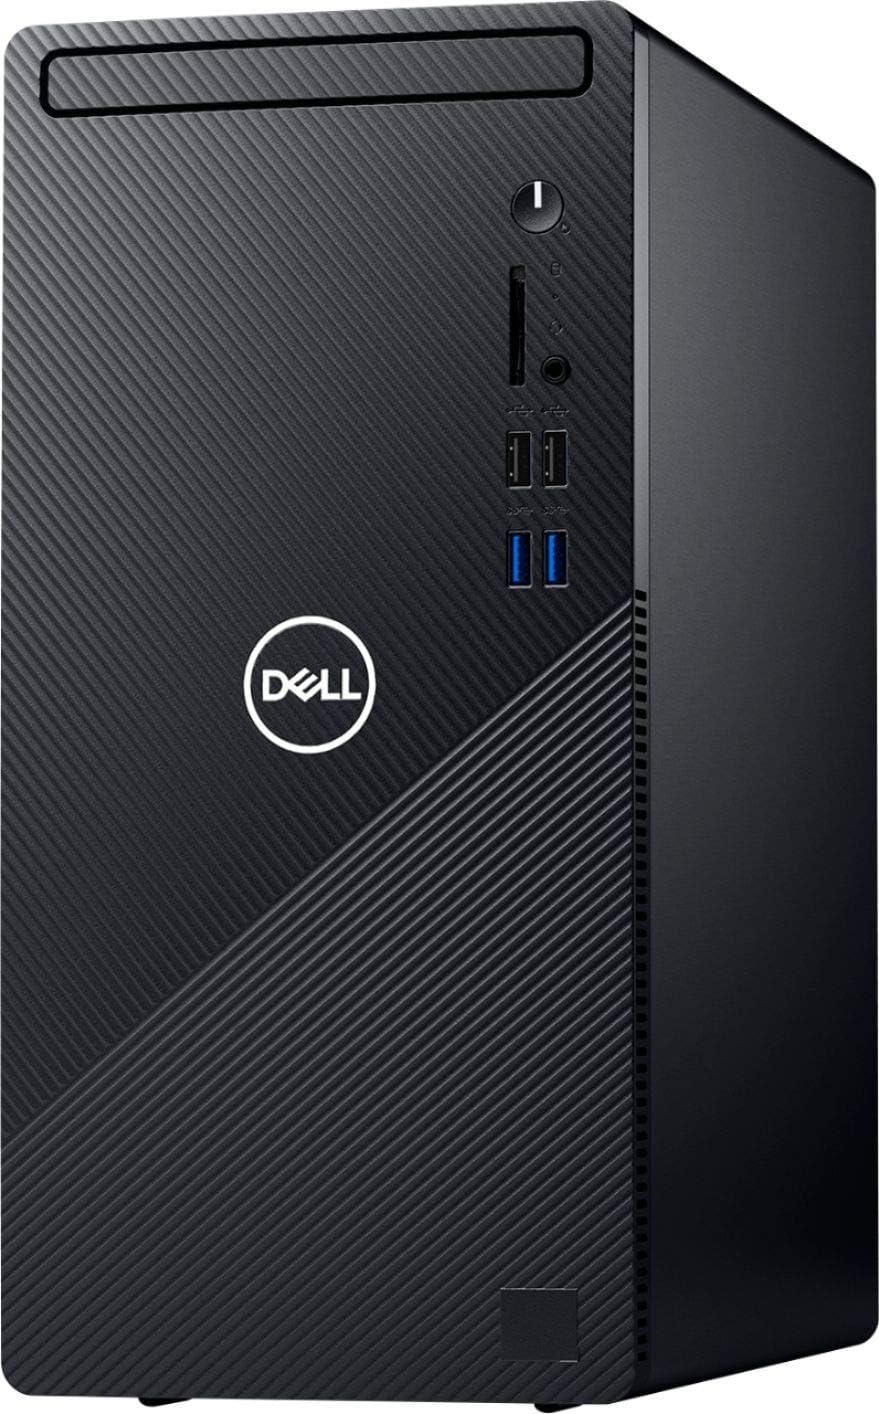 Dell Inspiron 2021 Premium Desktop Computer, 6 Core Intel Core i5-10400 2.90 GHz, 8GB RAM, 256GB SSD+1TB HDD, Wired Mouse & Keyboard,Bluetooth,Wi-Fi,VGA, RJ-45, HDMI,No DVD,Windows 10